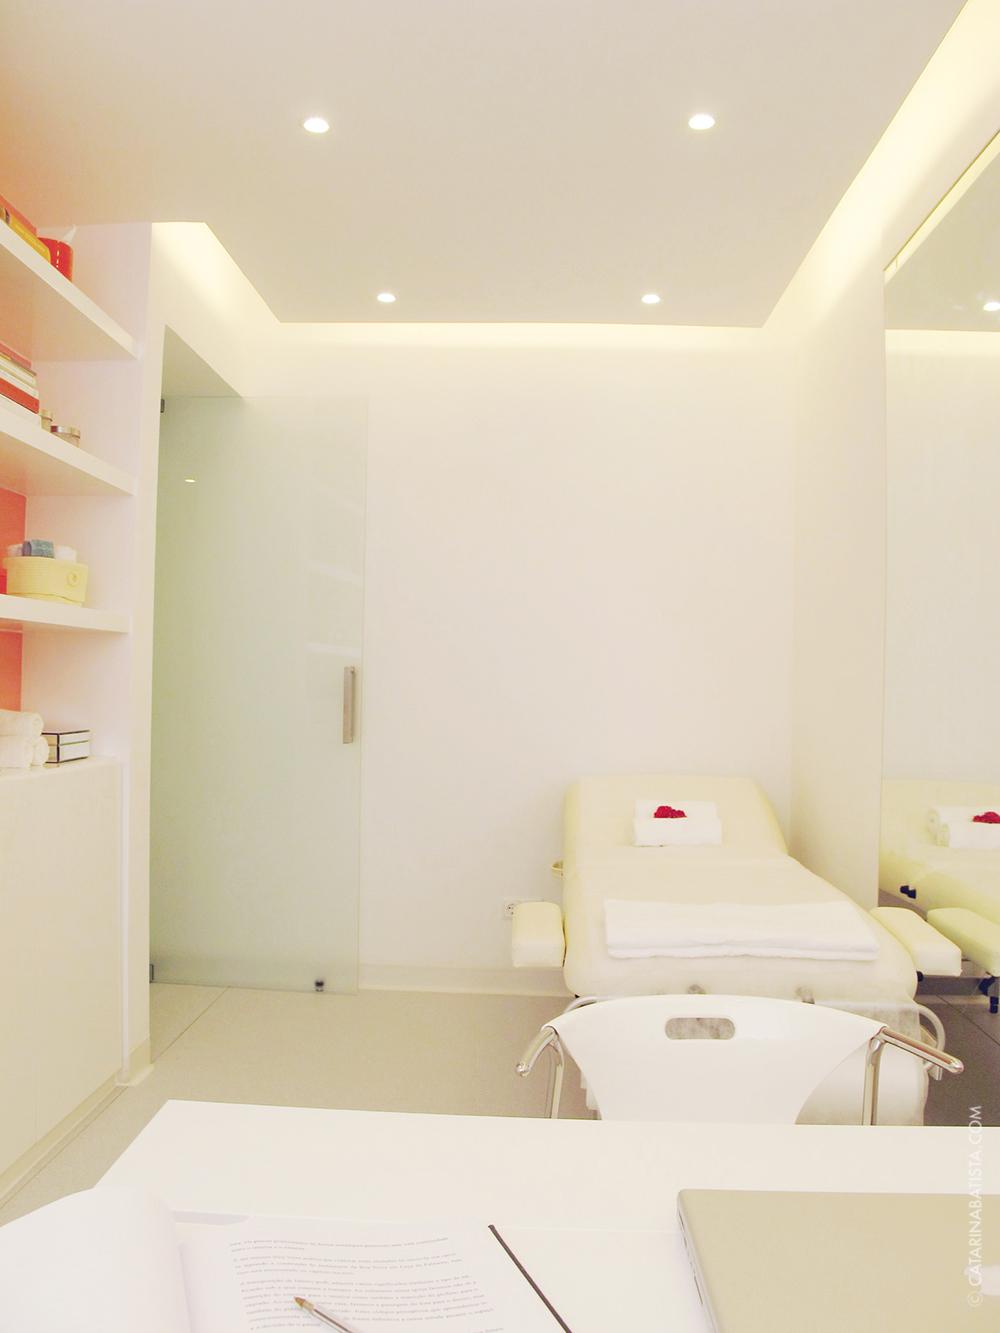 023-catarina-batista-arquitectura-design-interior-decoracao-clinicia.jpg